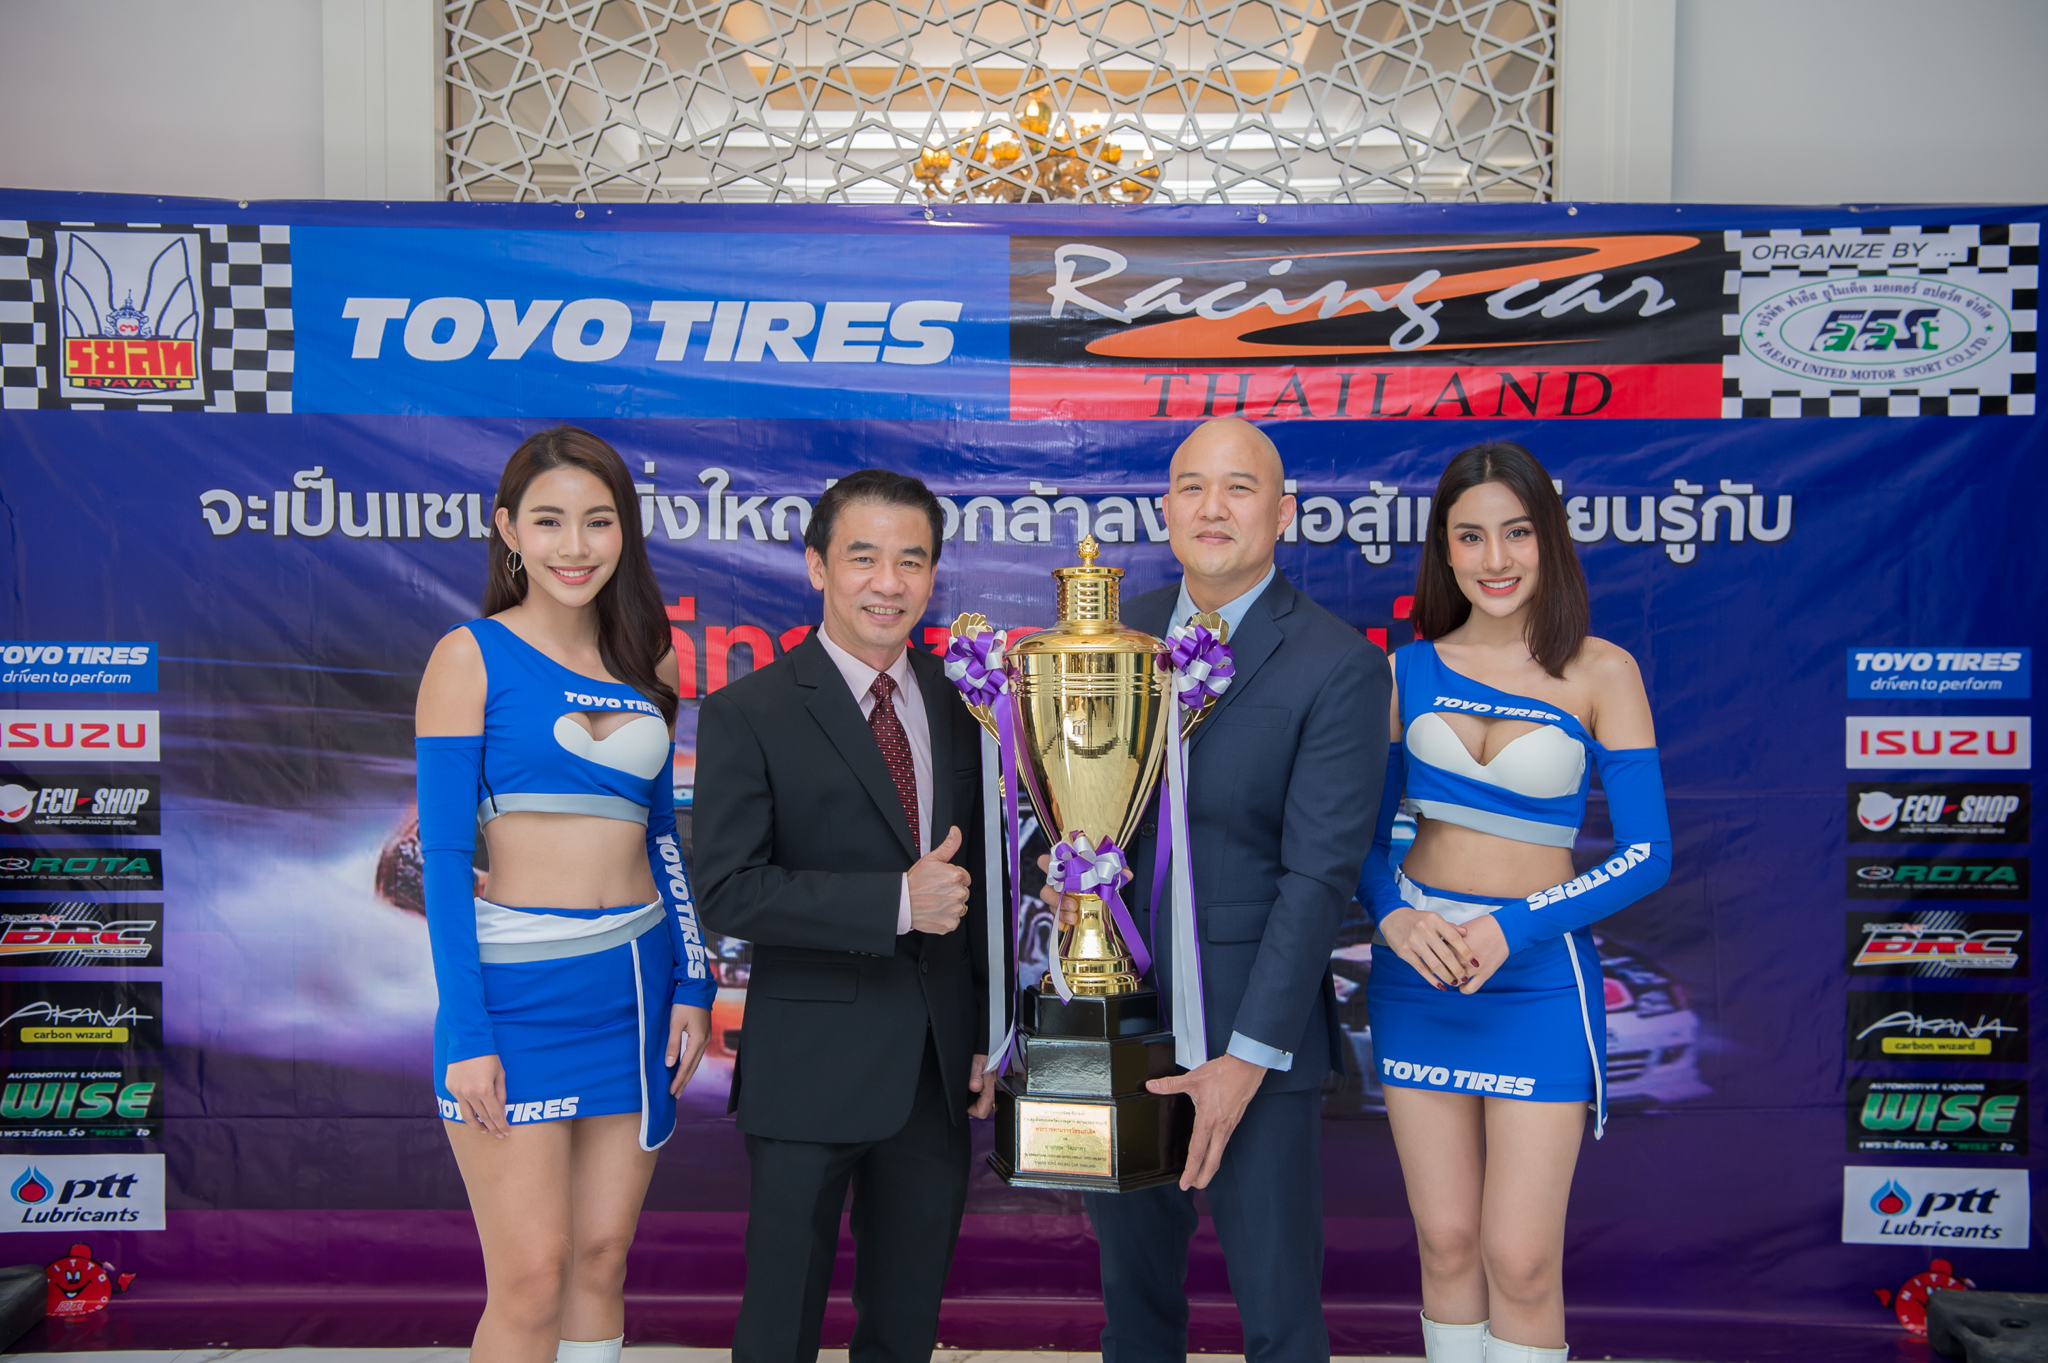 "TOYO TIRES RACING CAR THAILAND CHAMPION DAY 2020 ""กฤษ วัฒนาพร"" คว้ารางวัลถ้วยพระราชทาน ฉลองแชมป์อย่างยิ่งใหญ่"